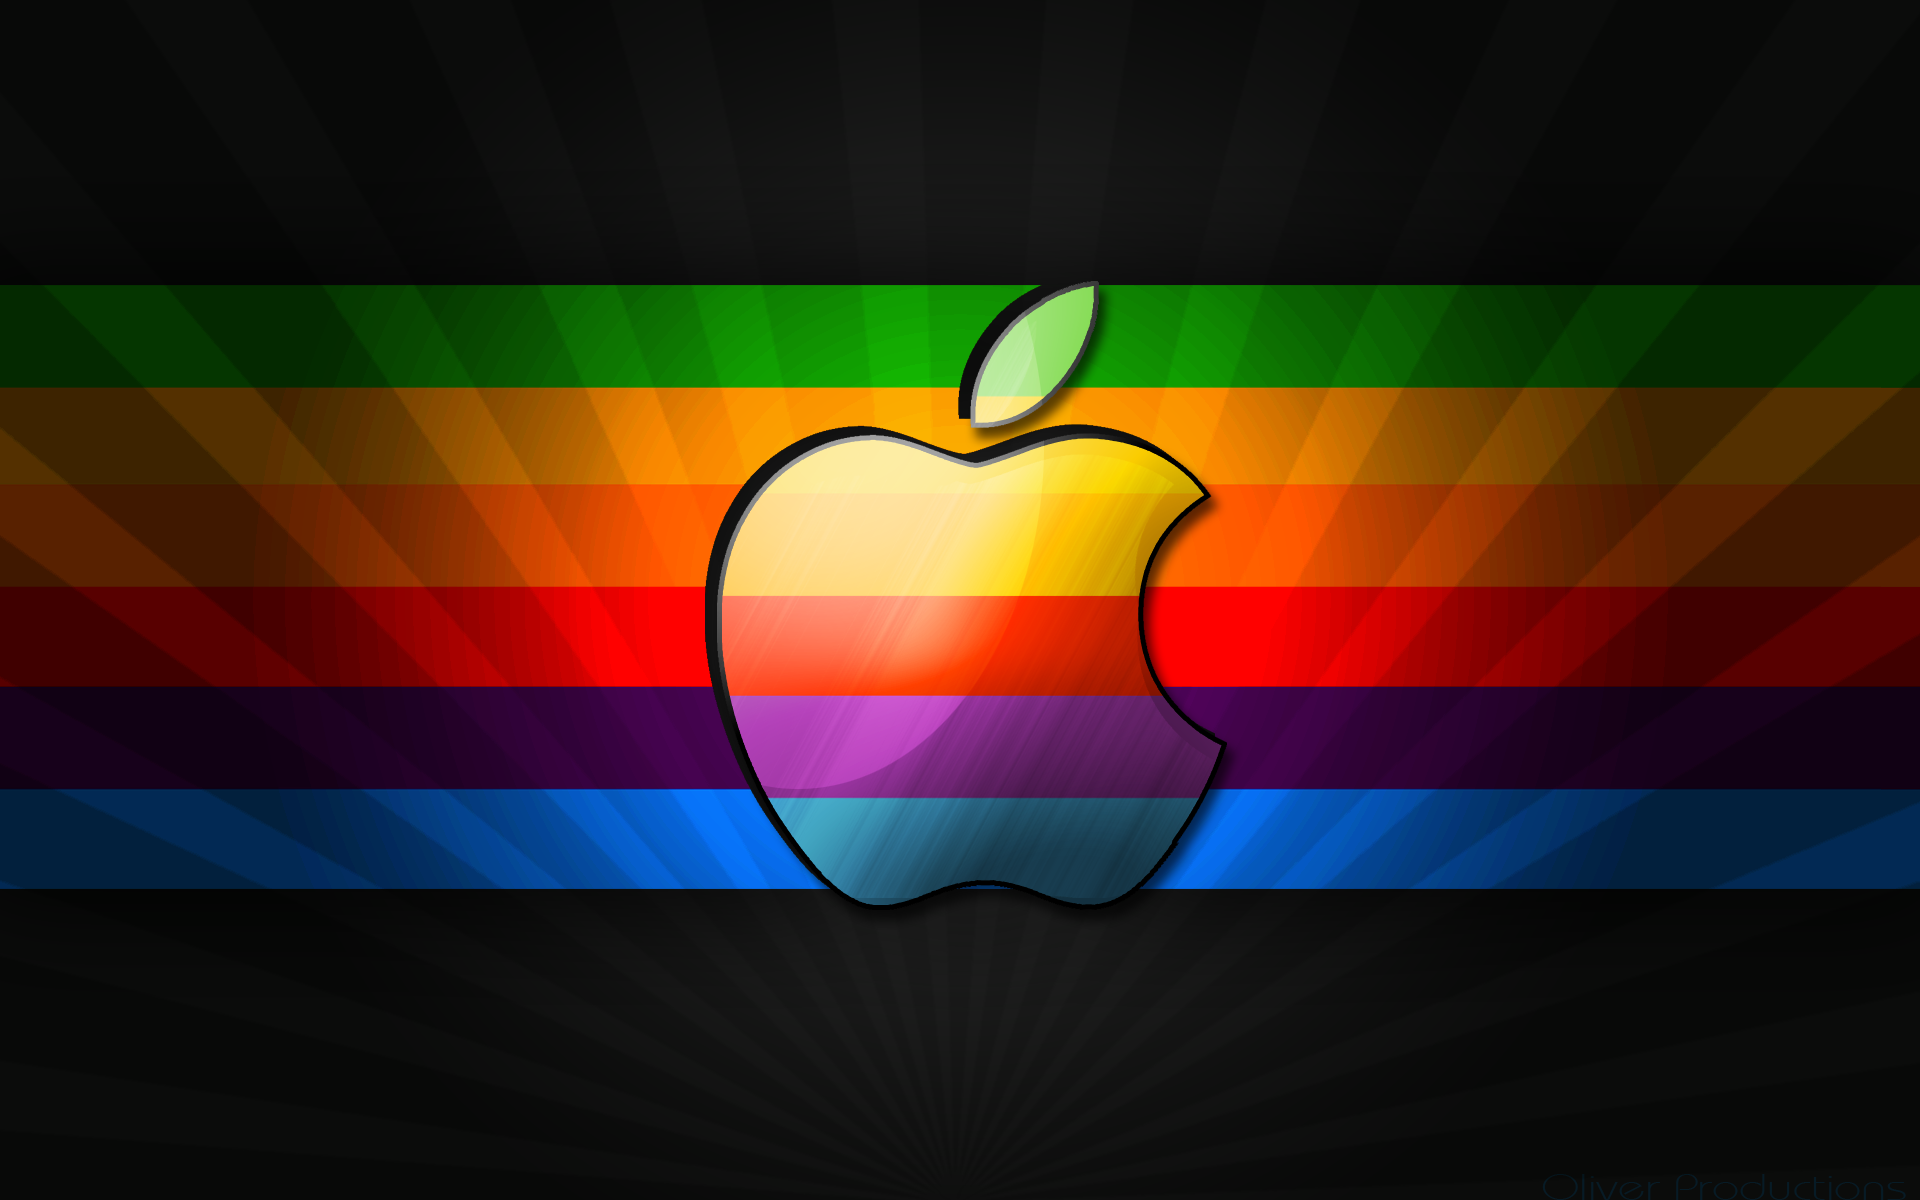 apple iphone wallpaper 244763